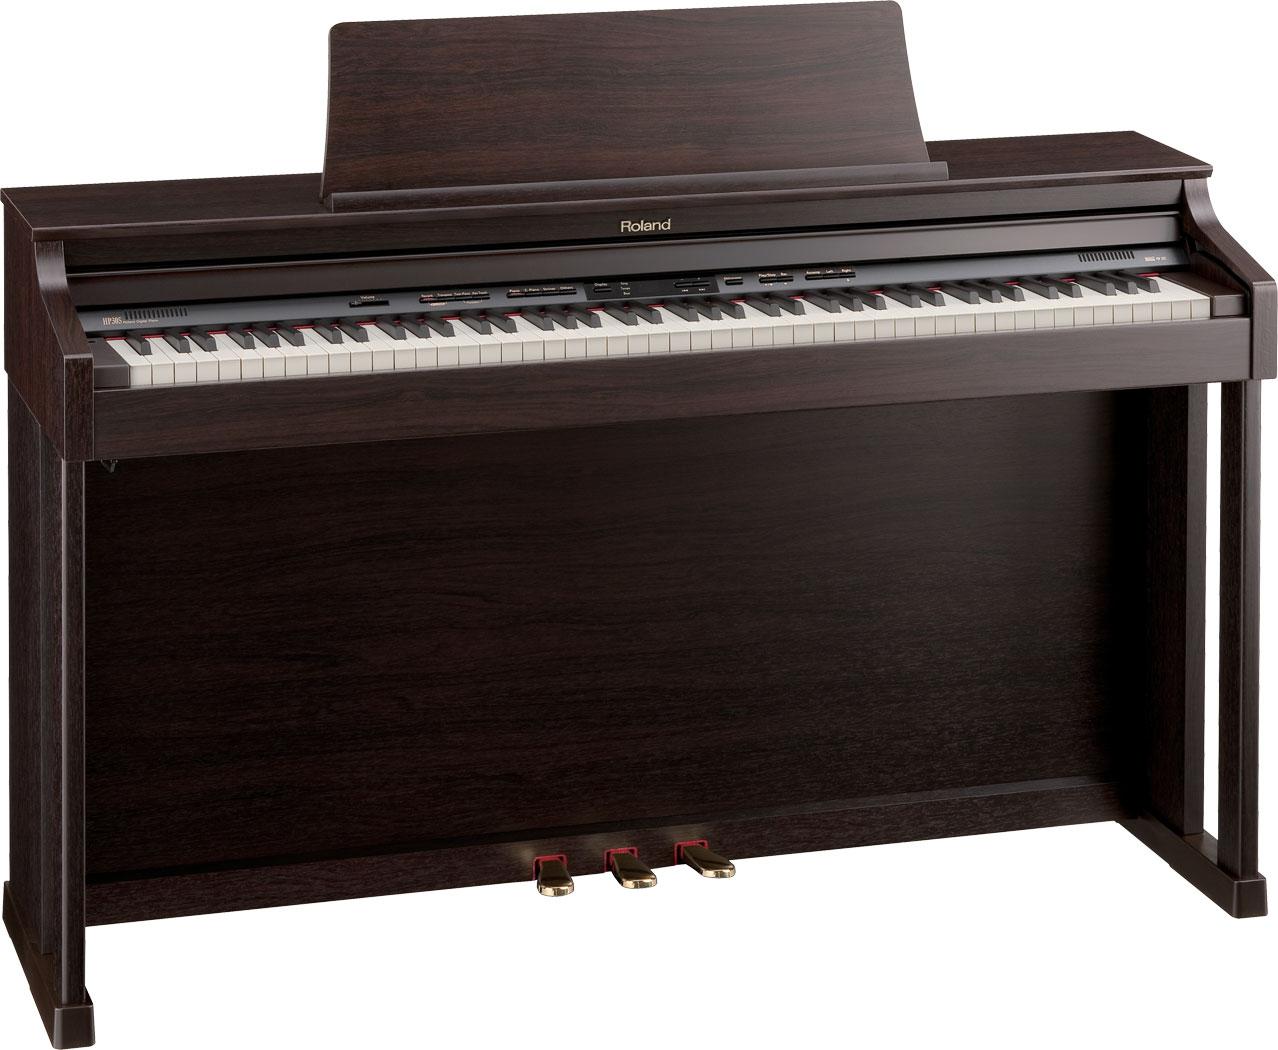 az piano reviews review kawai cn43 roland hp305 yamaha clp440 digital piano comparison. Black Bedroom Furniture Sets. Home Design Ideas